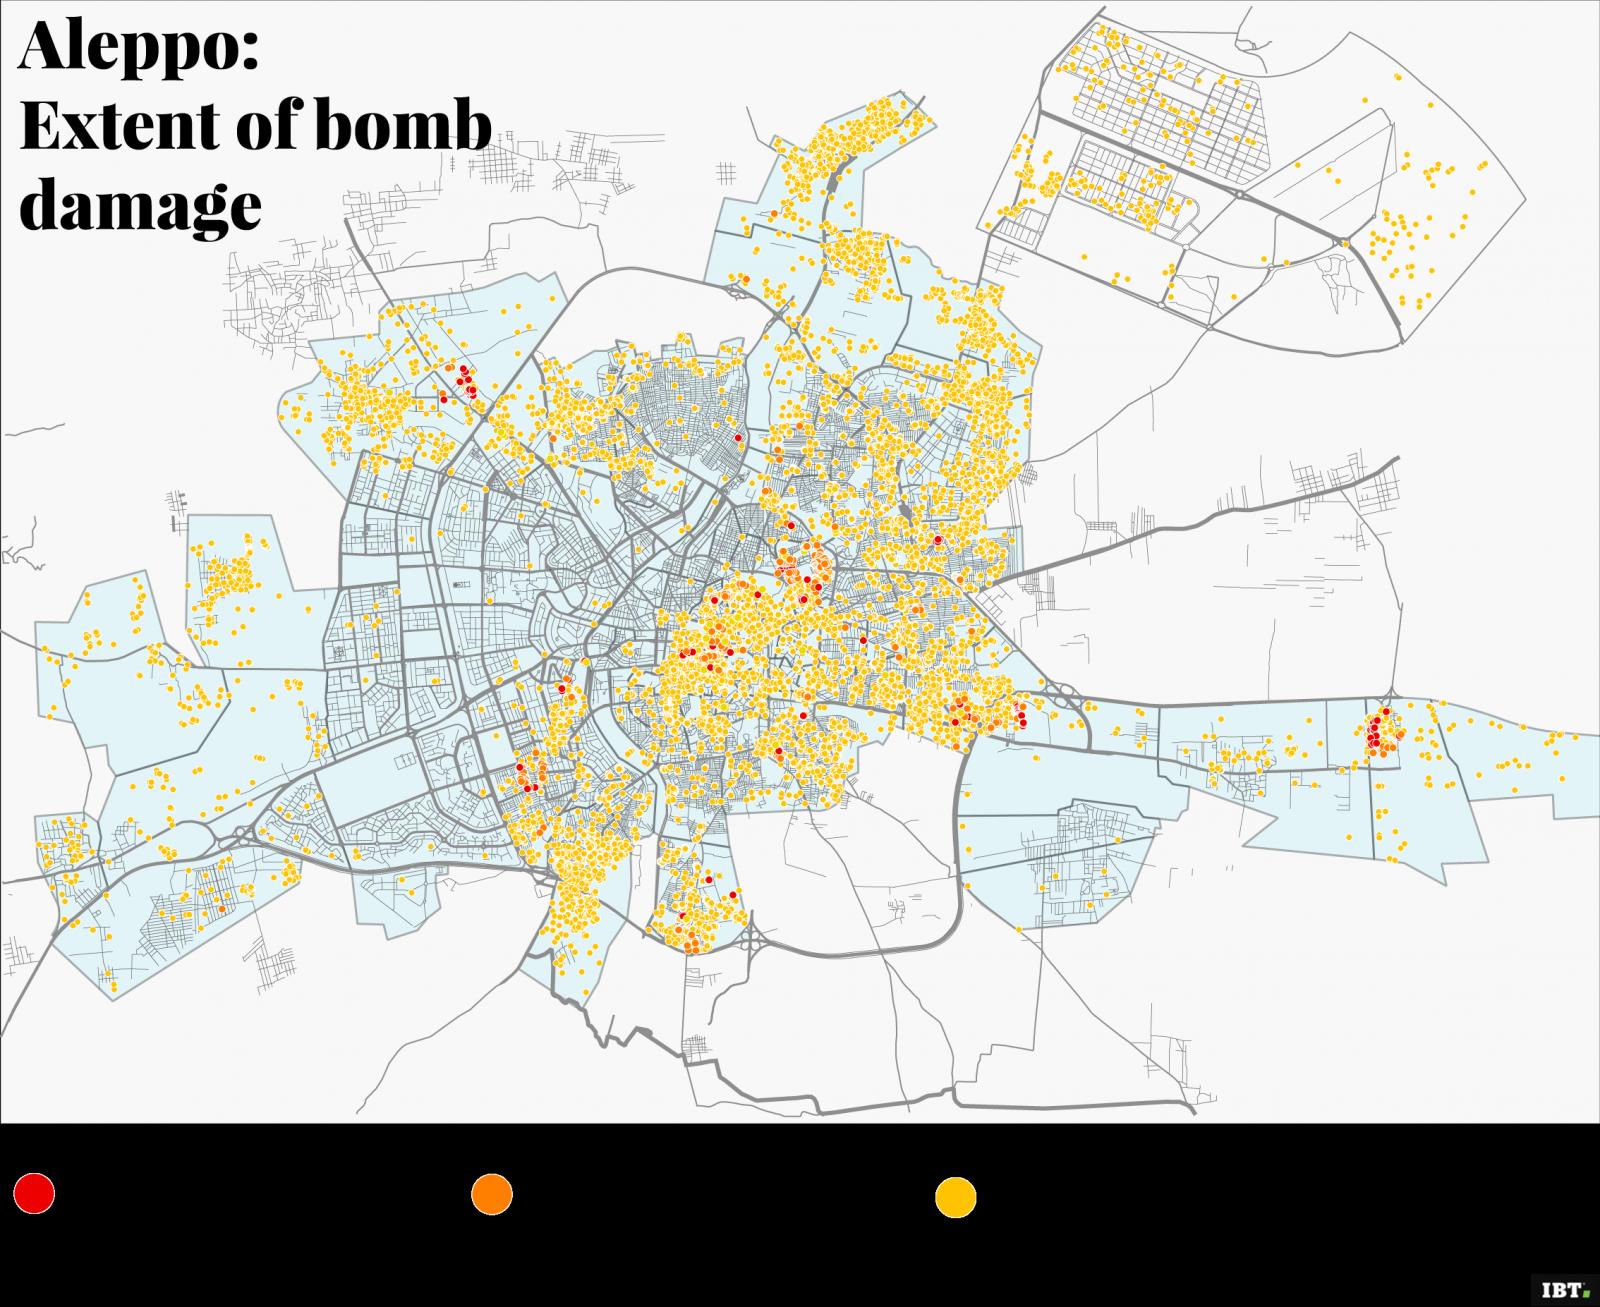 Aleppo: extent of bomb damage